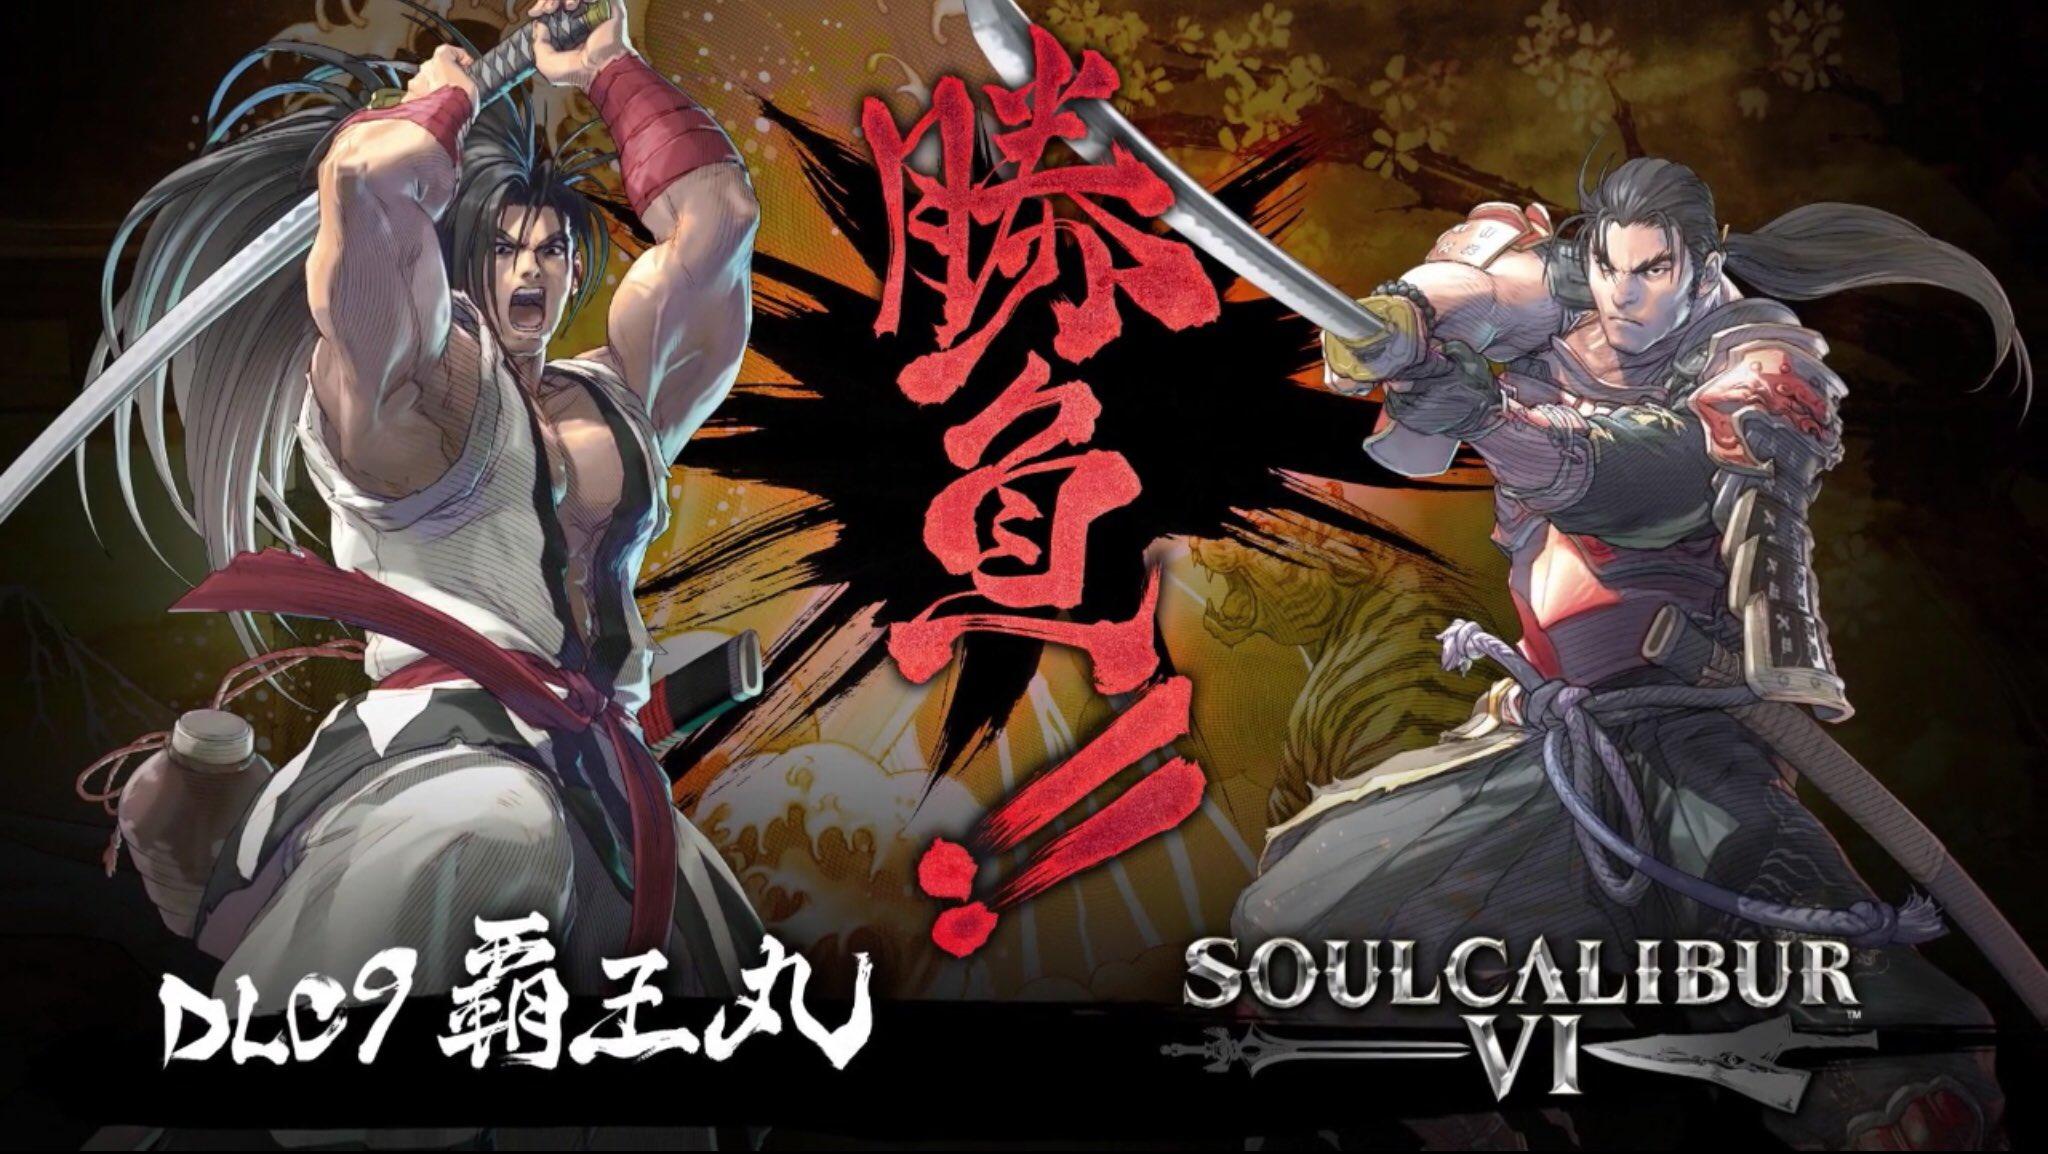 SouCalibur VI | Haohmaru de Samurai Shodown se une a la lucha en este trailer.